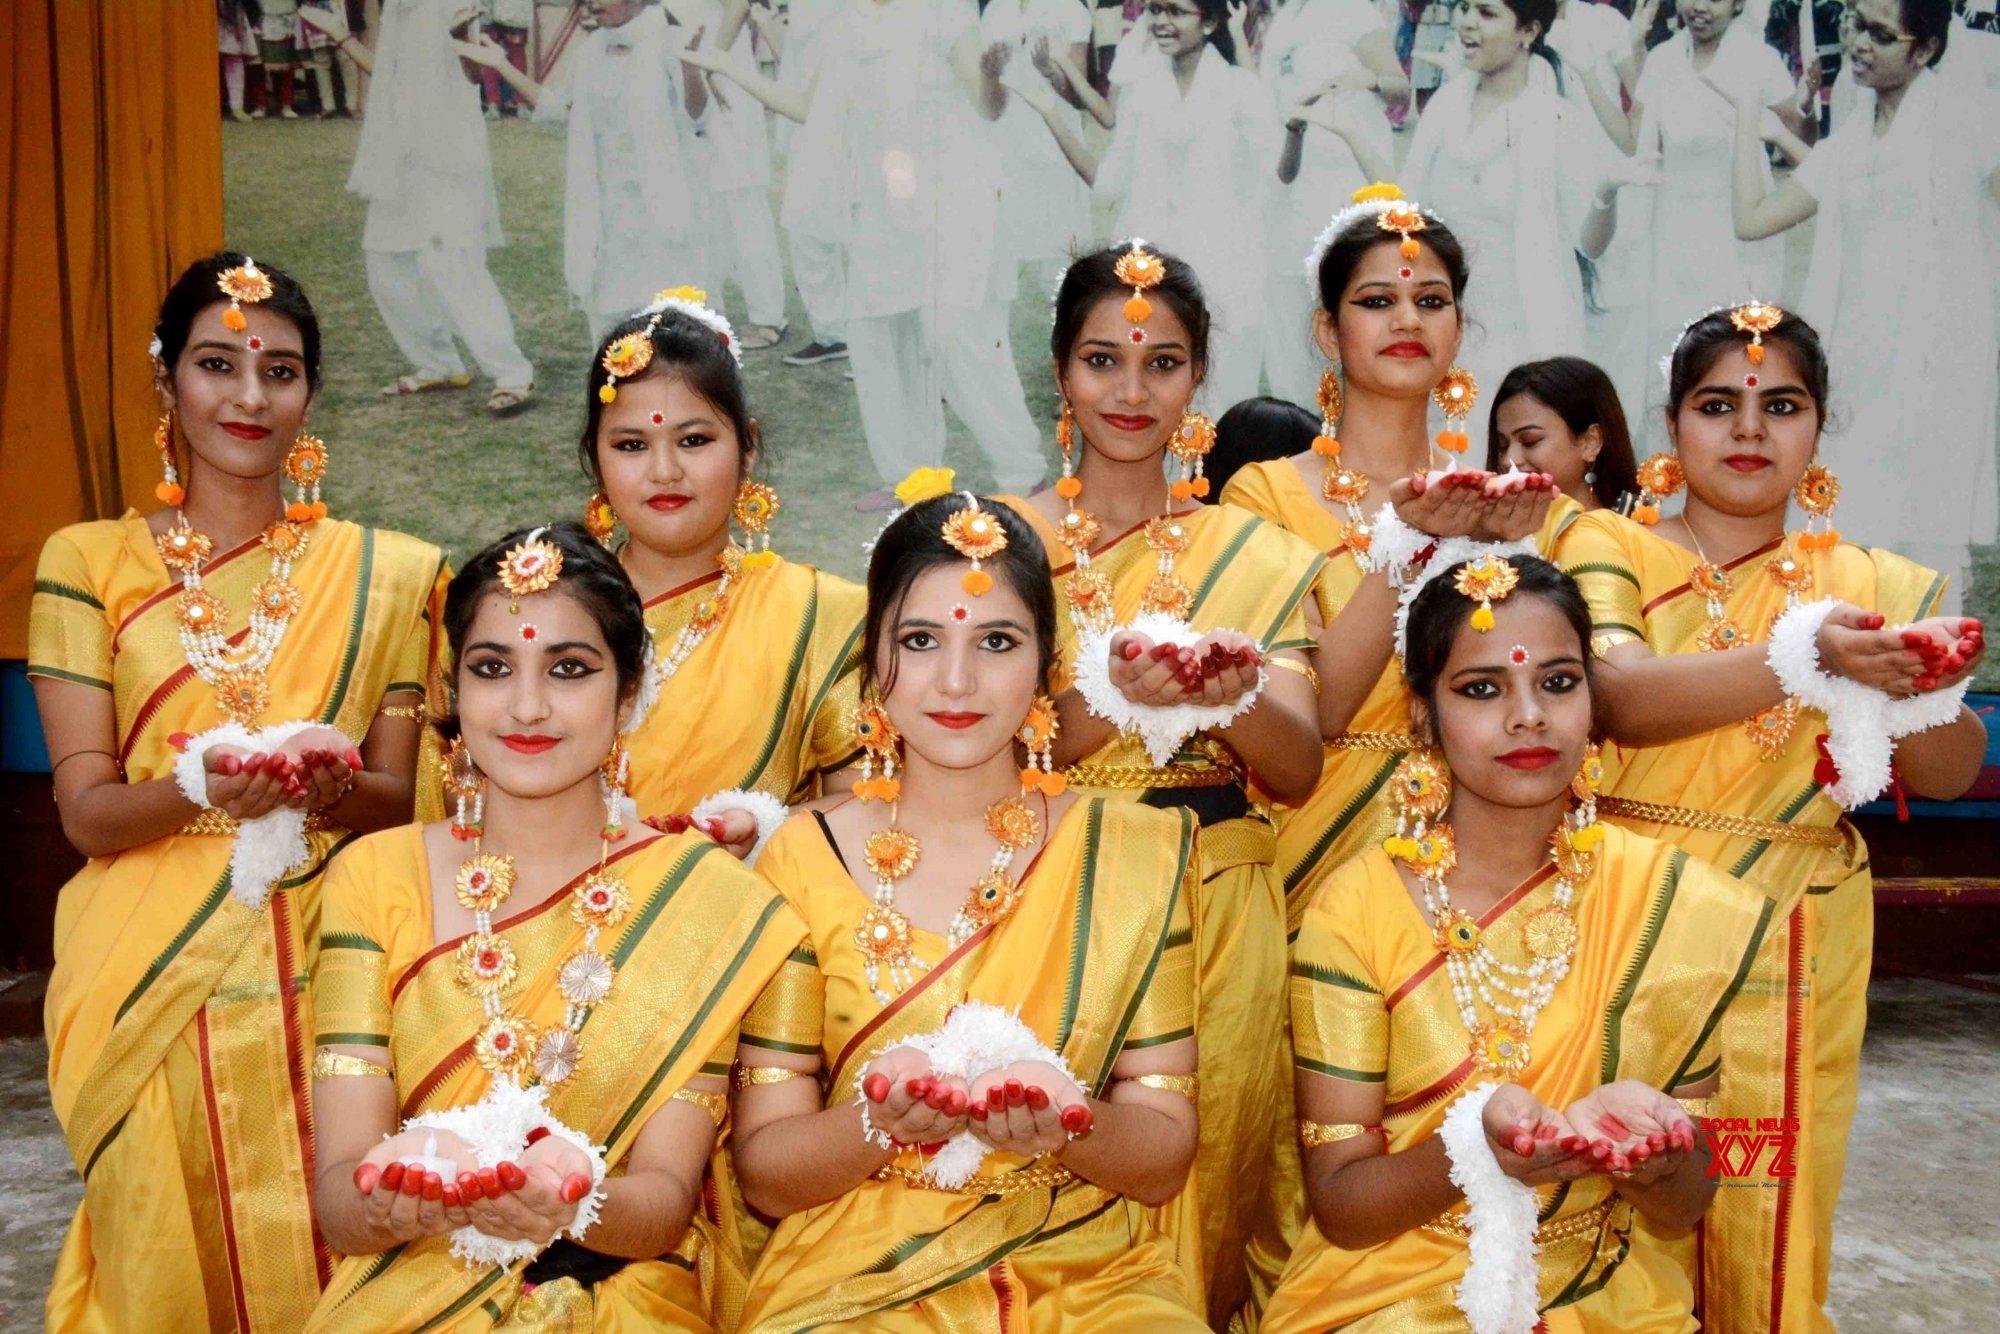 Patna Patna Women S College Annual Day Celebrations Gallery Social News Xyz